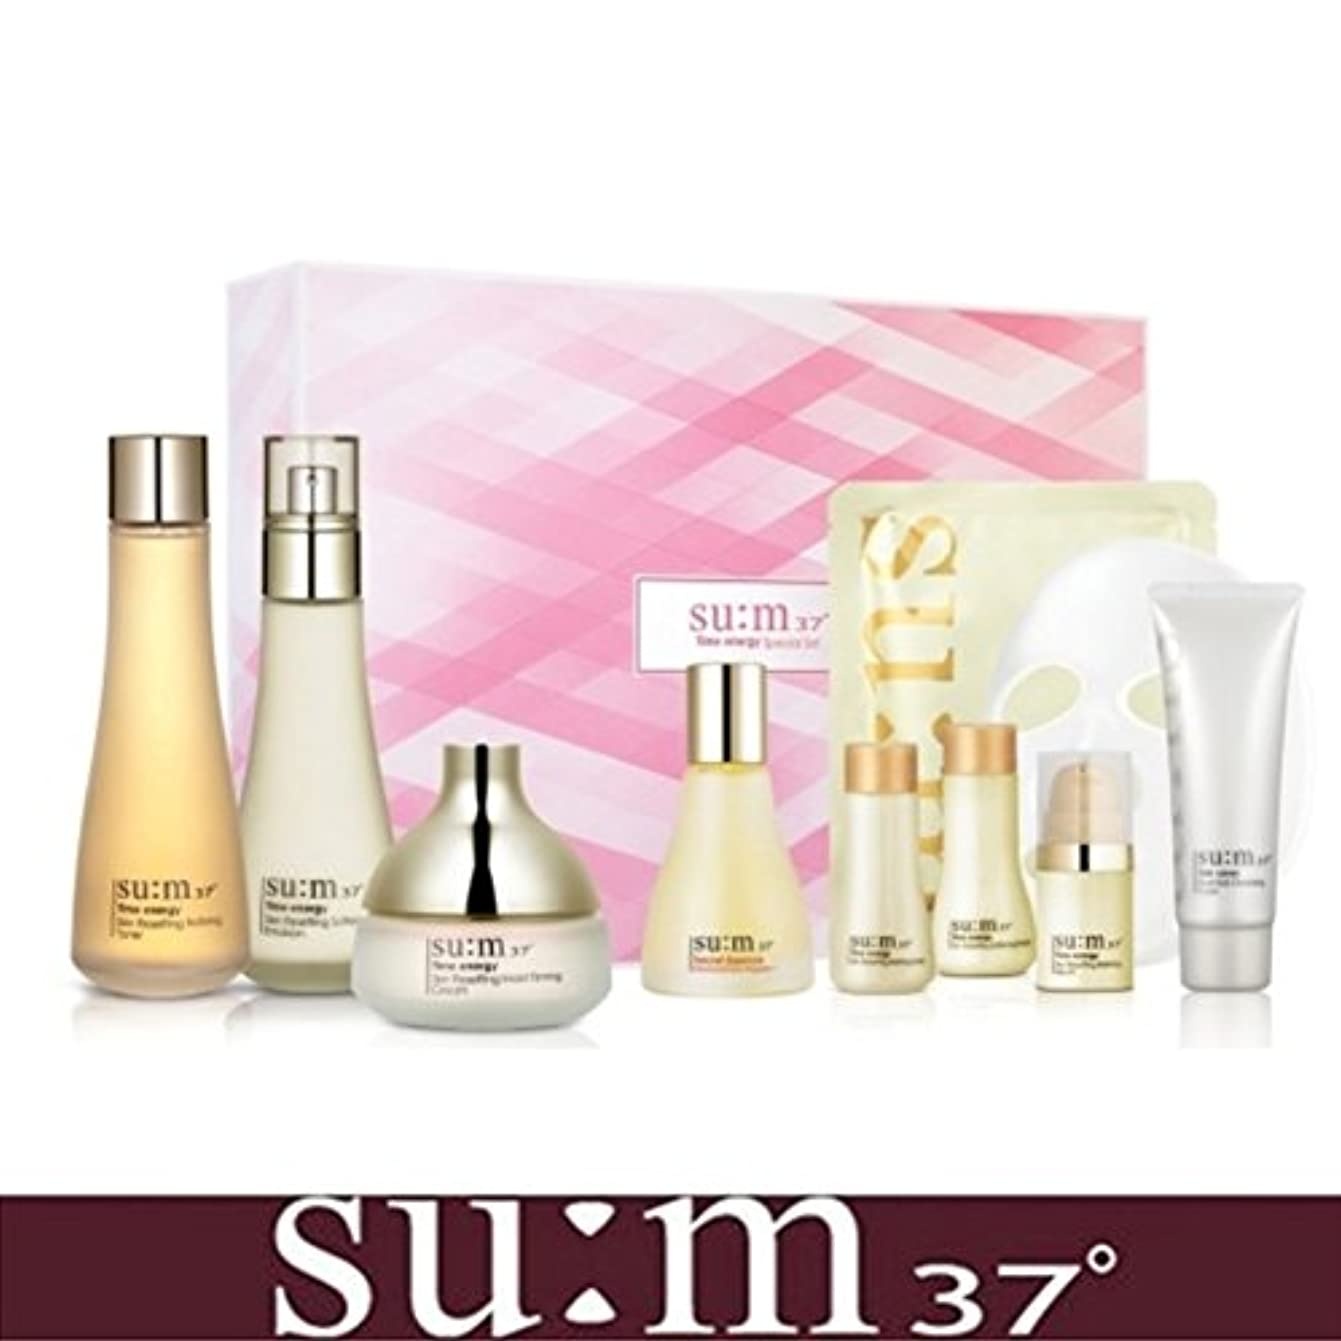 [su:m37/スム37°] SUM37 Time Energy 3pcs Special Skincare Set / タイムエネルギーの3種のスペシャルセット+[Sample Gift](海外直送品)